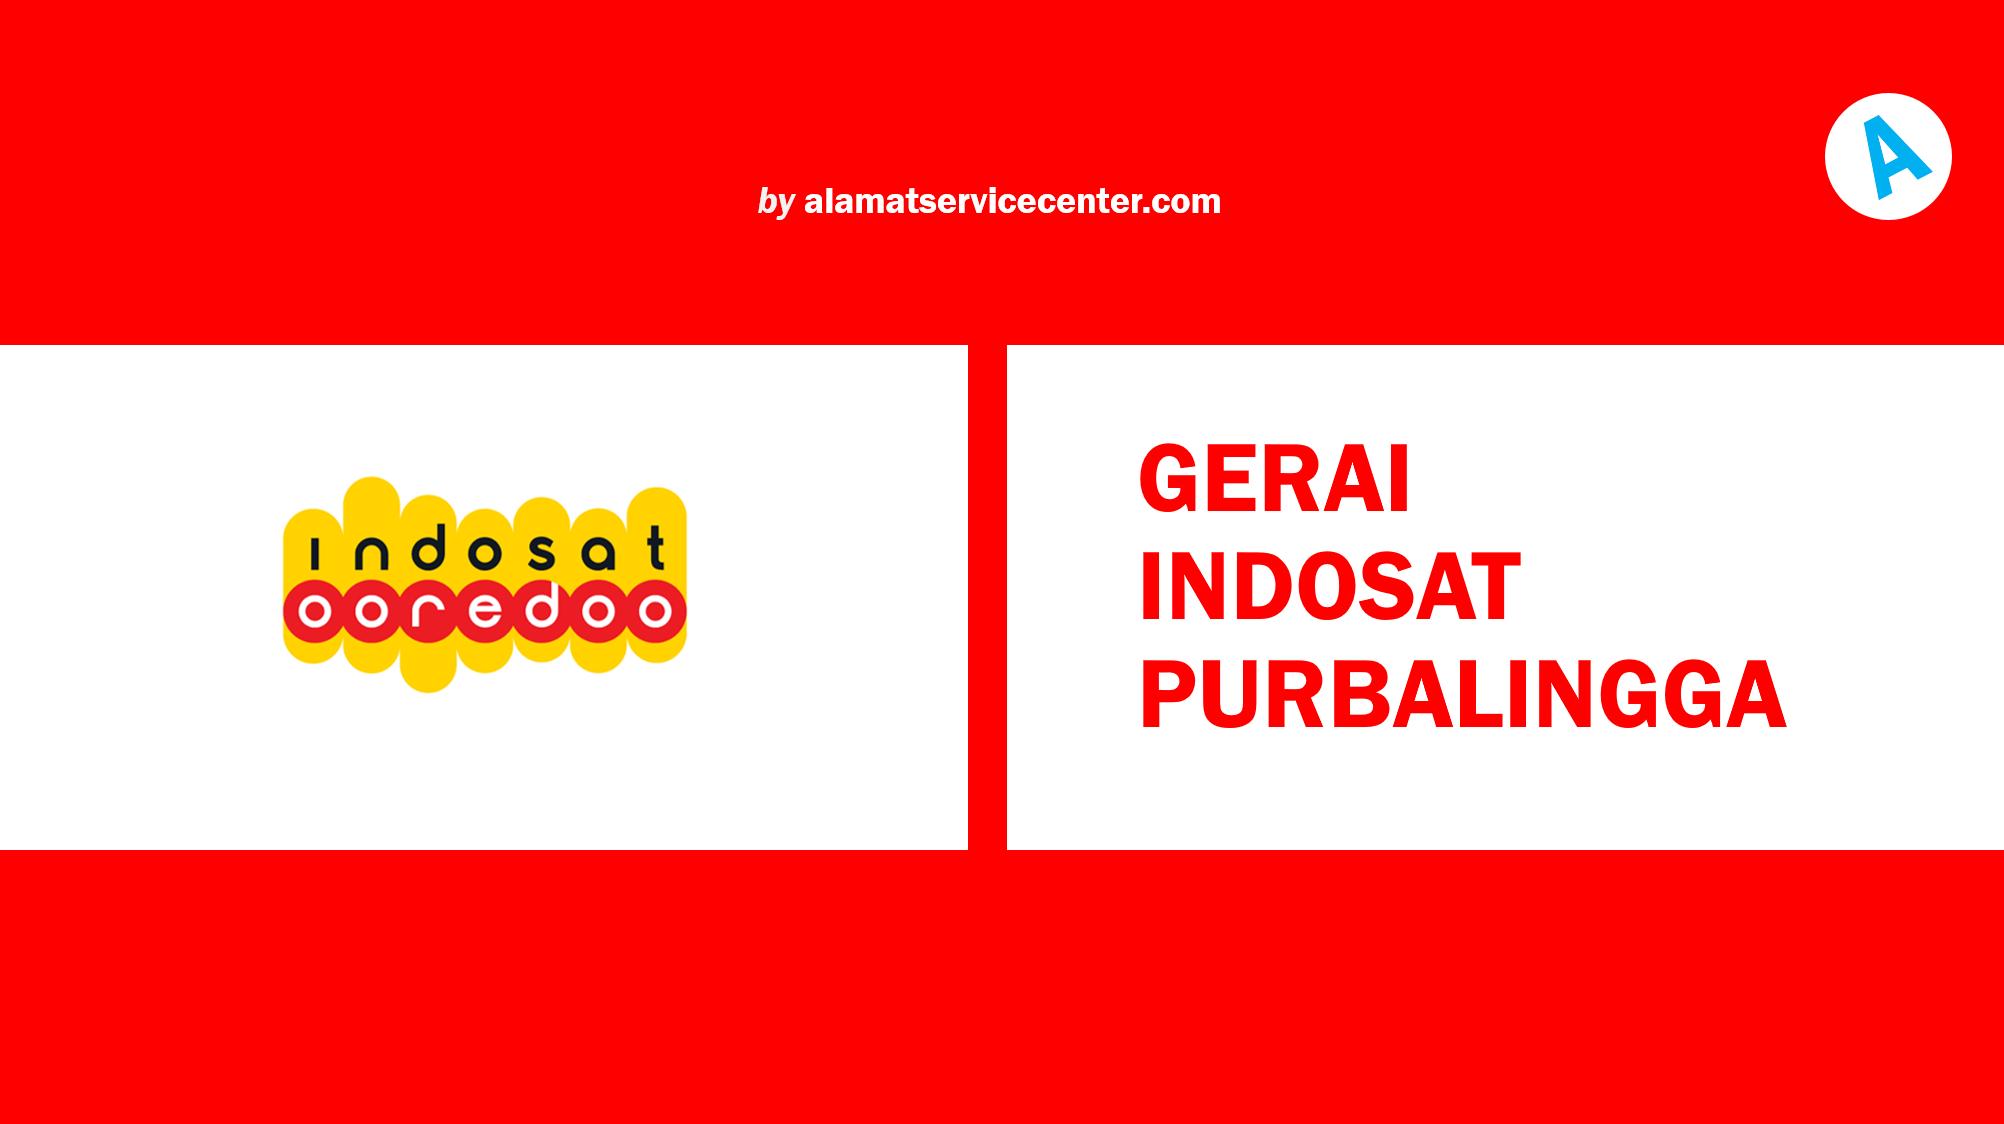 Gerai Indosat Purbalingga